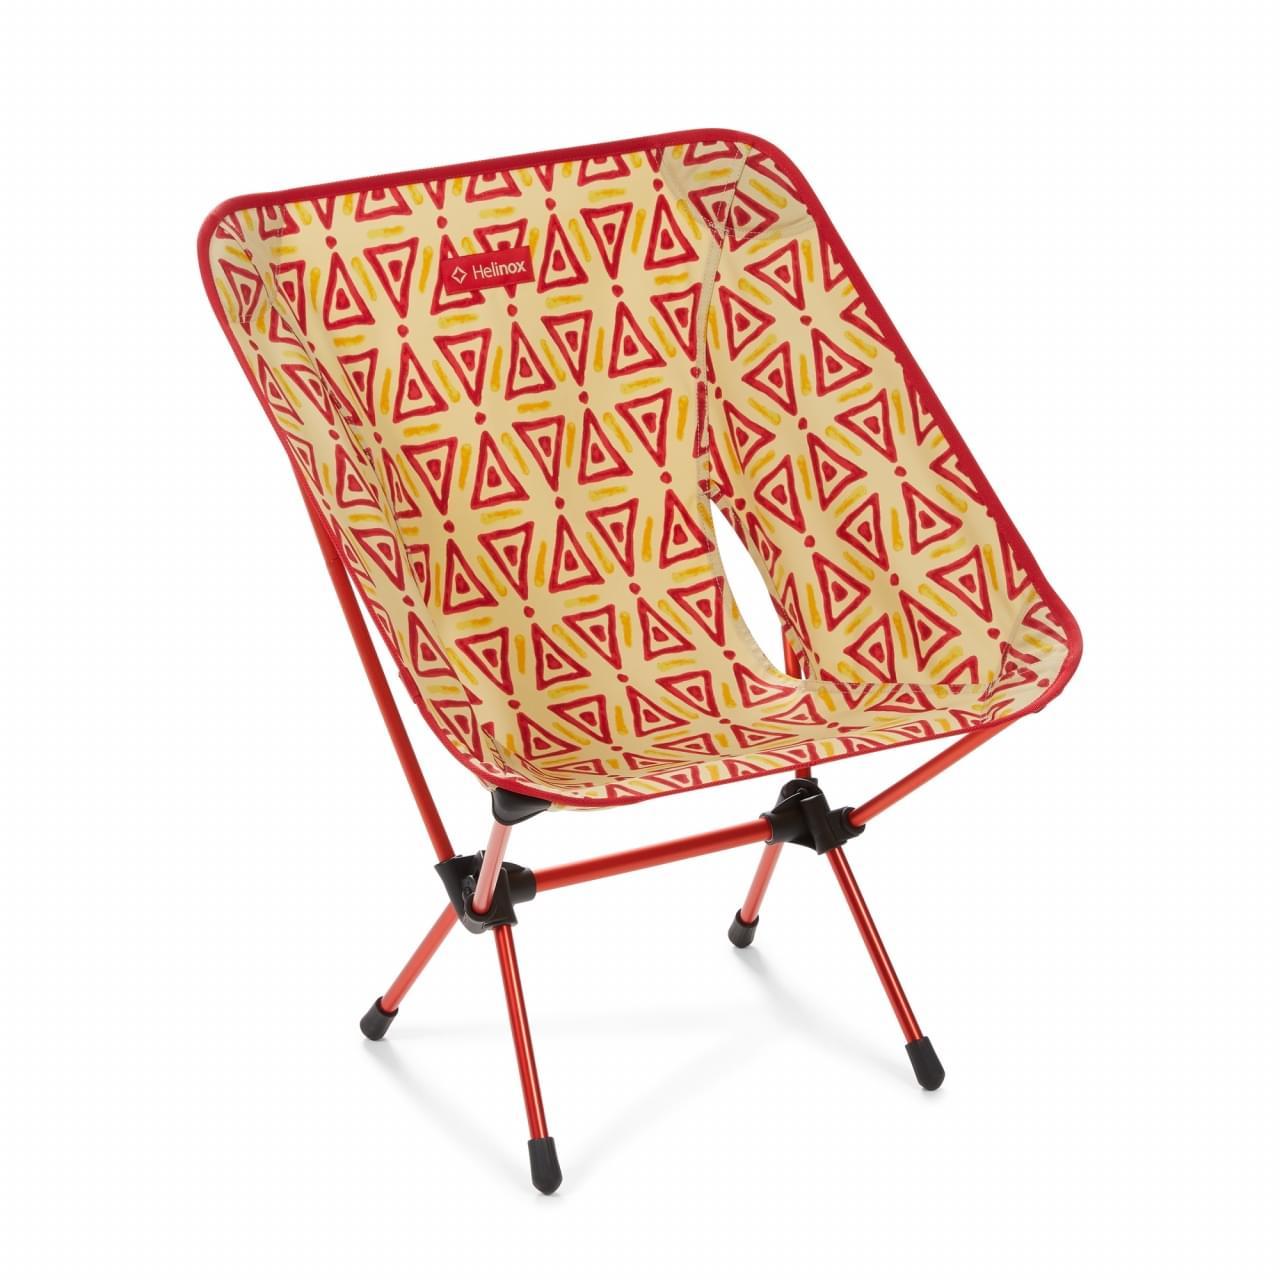 Helinox Chair One Triangle Lichtgewicht Stoel